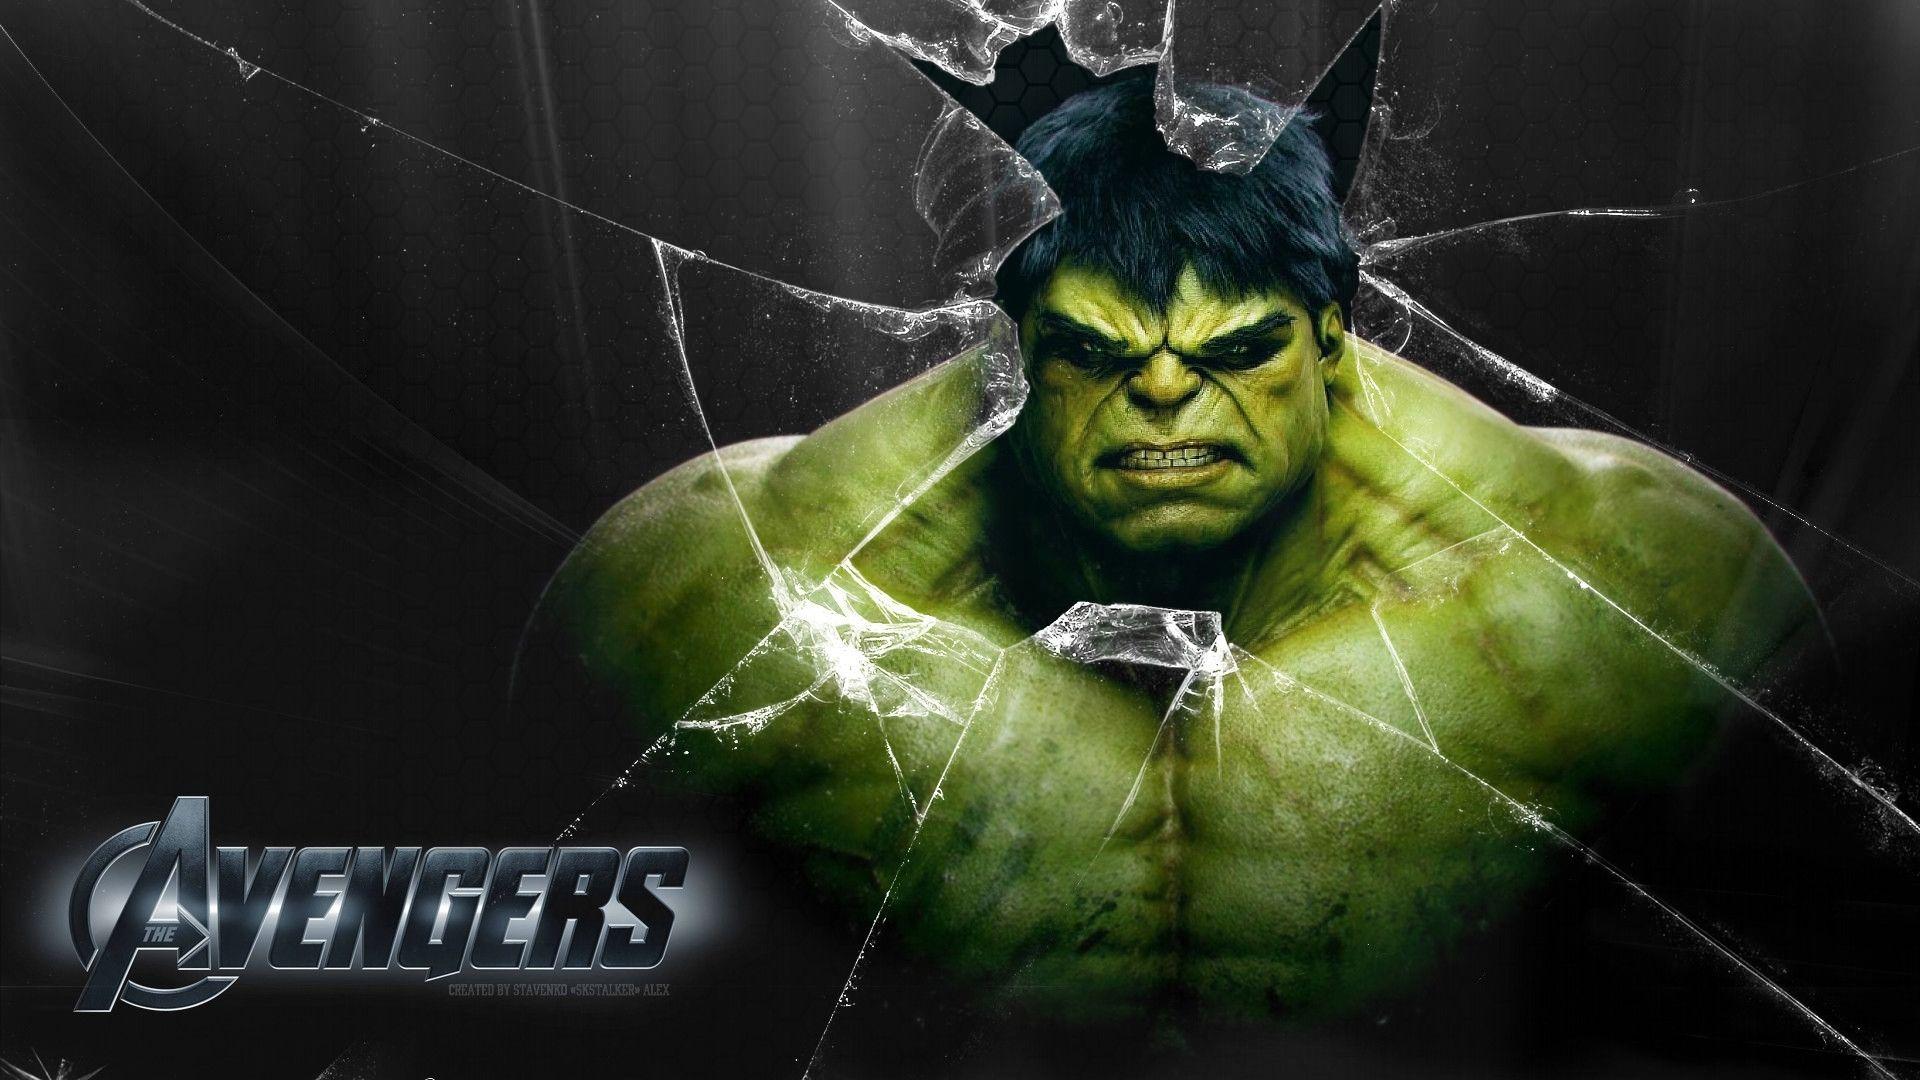 10 New Hulk Hd Wallpapers 1920x1080 Full Hd 1080p For Pc Background Avengers Wallpaper Hulk Avengers New Hulk